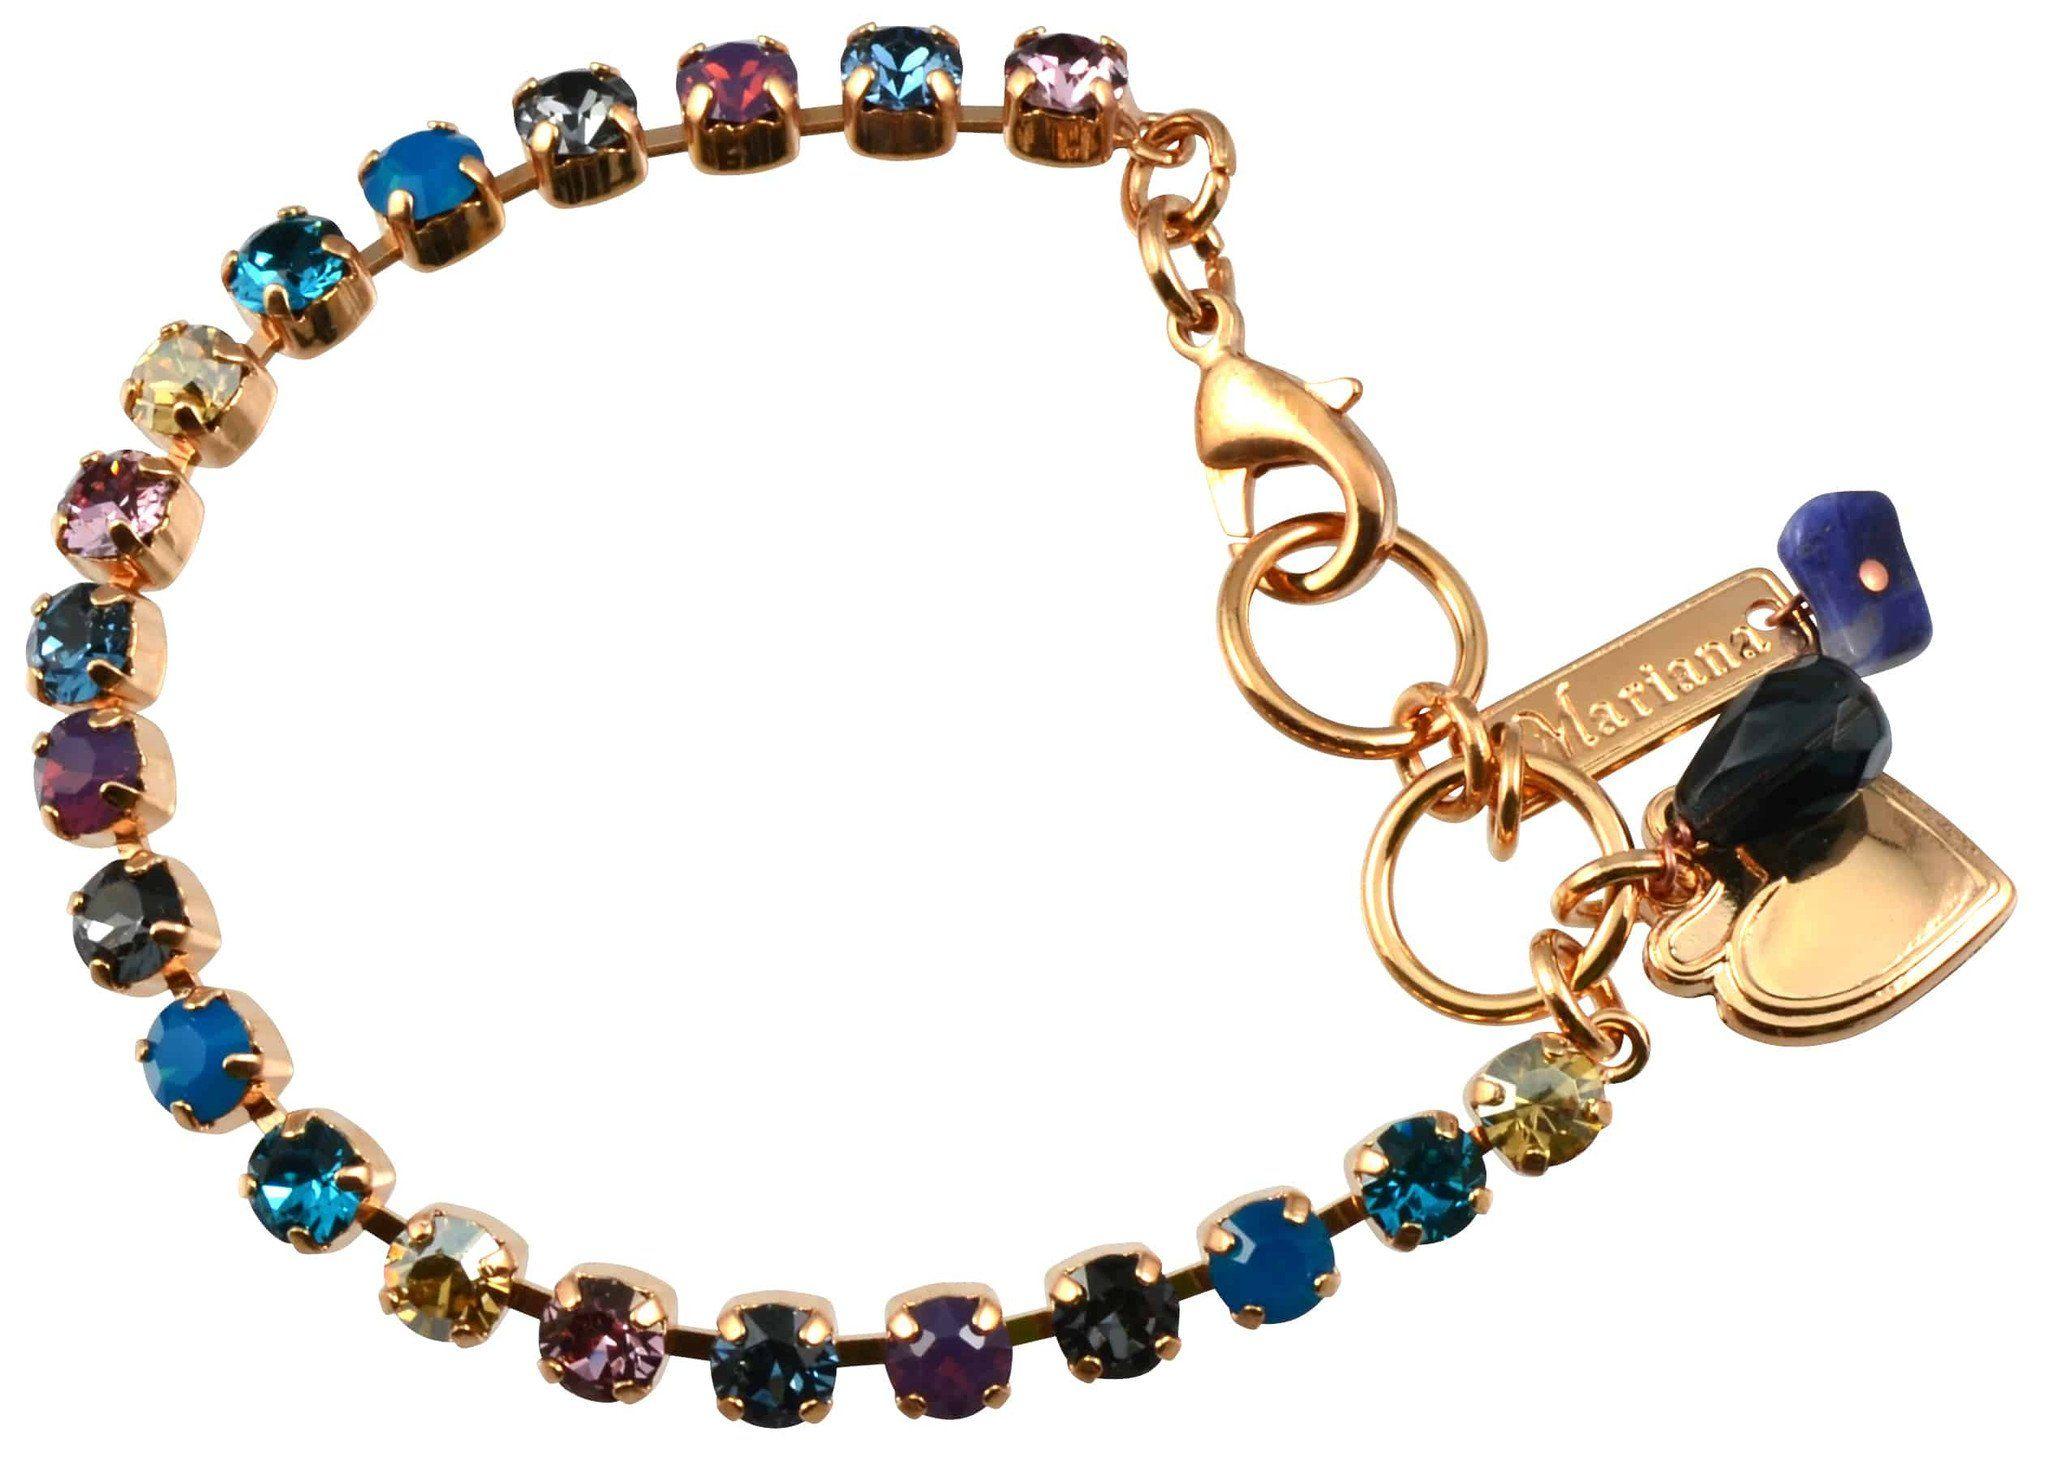 Mariana serenity rose gold plated swarovski crystal tennis bracelet